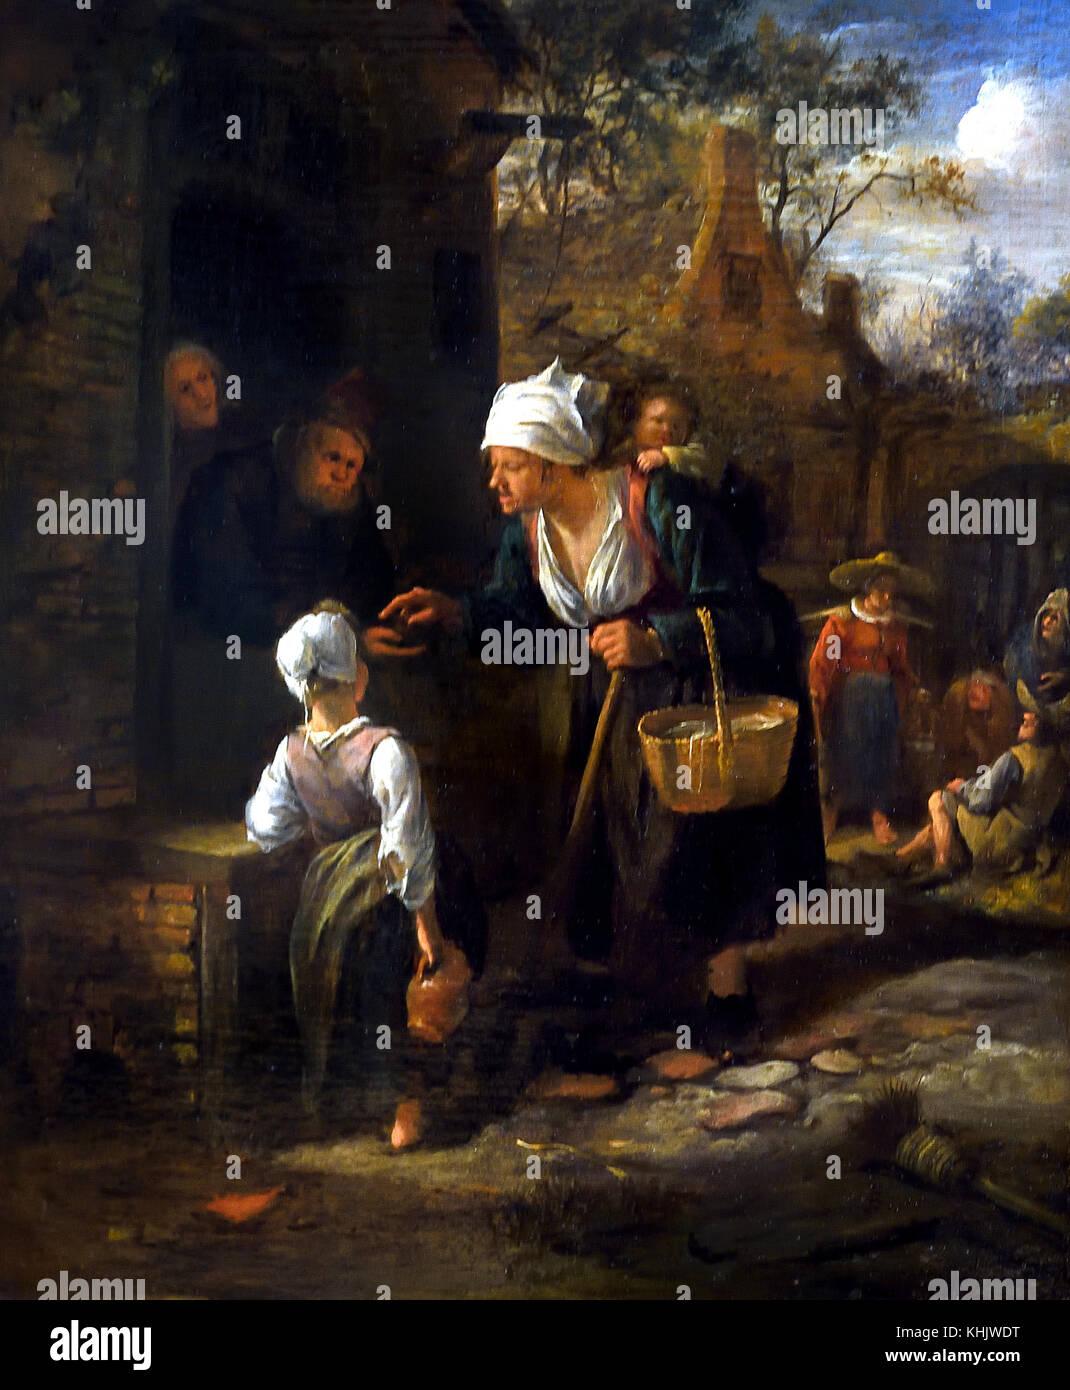 Jan STEEN 1626 - 1679 Dutch Netherlands - Stock Image